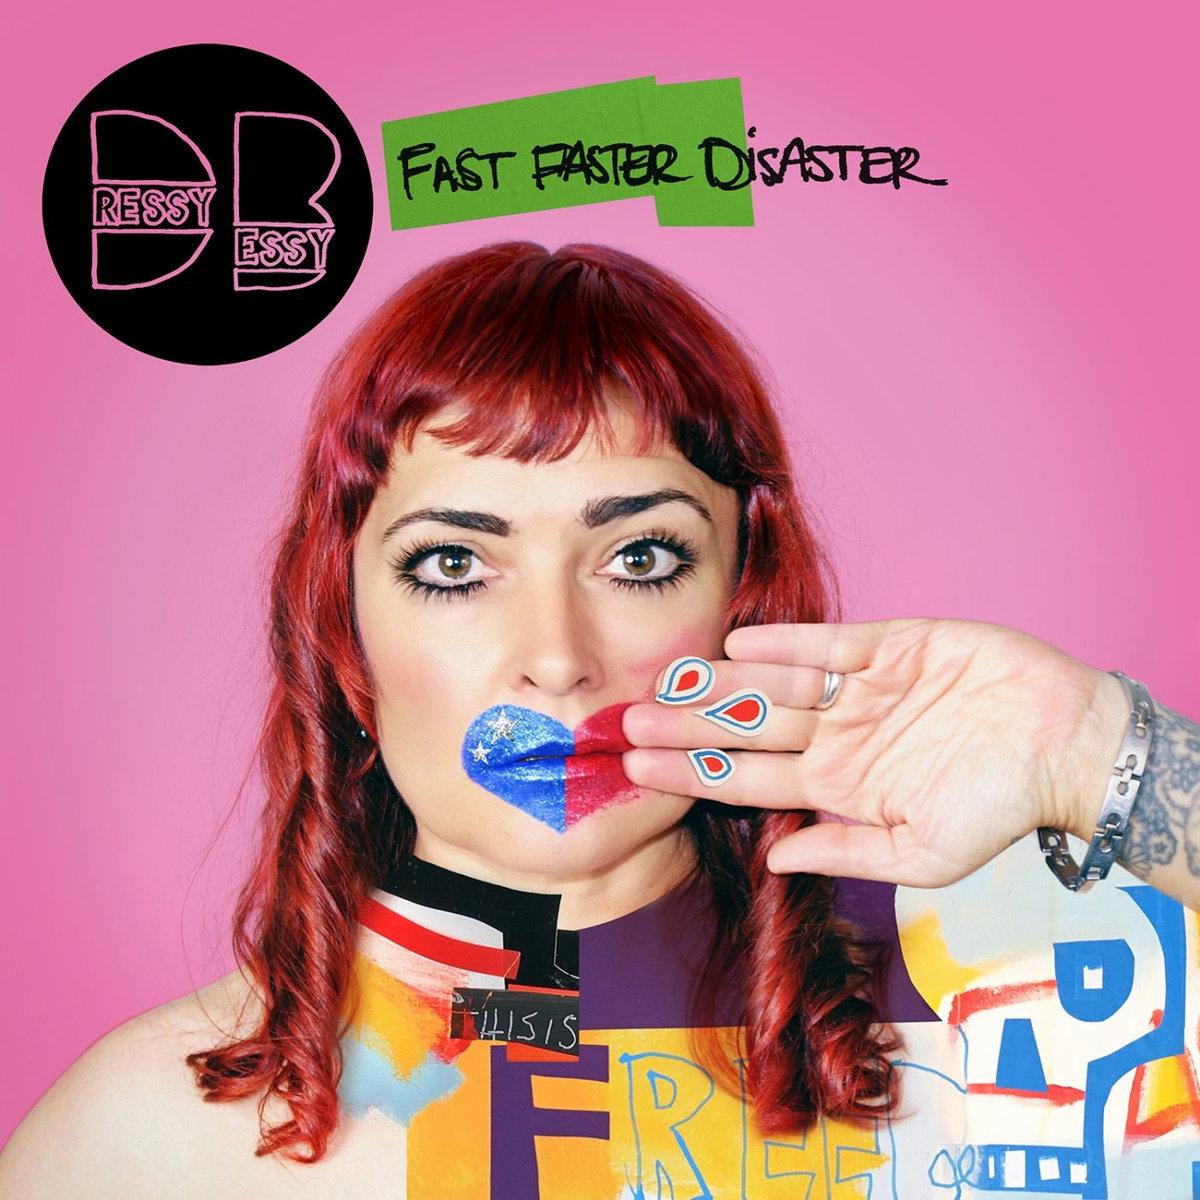 dressy bessy fast faster disaster [yep roc]